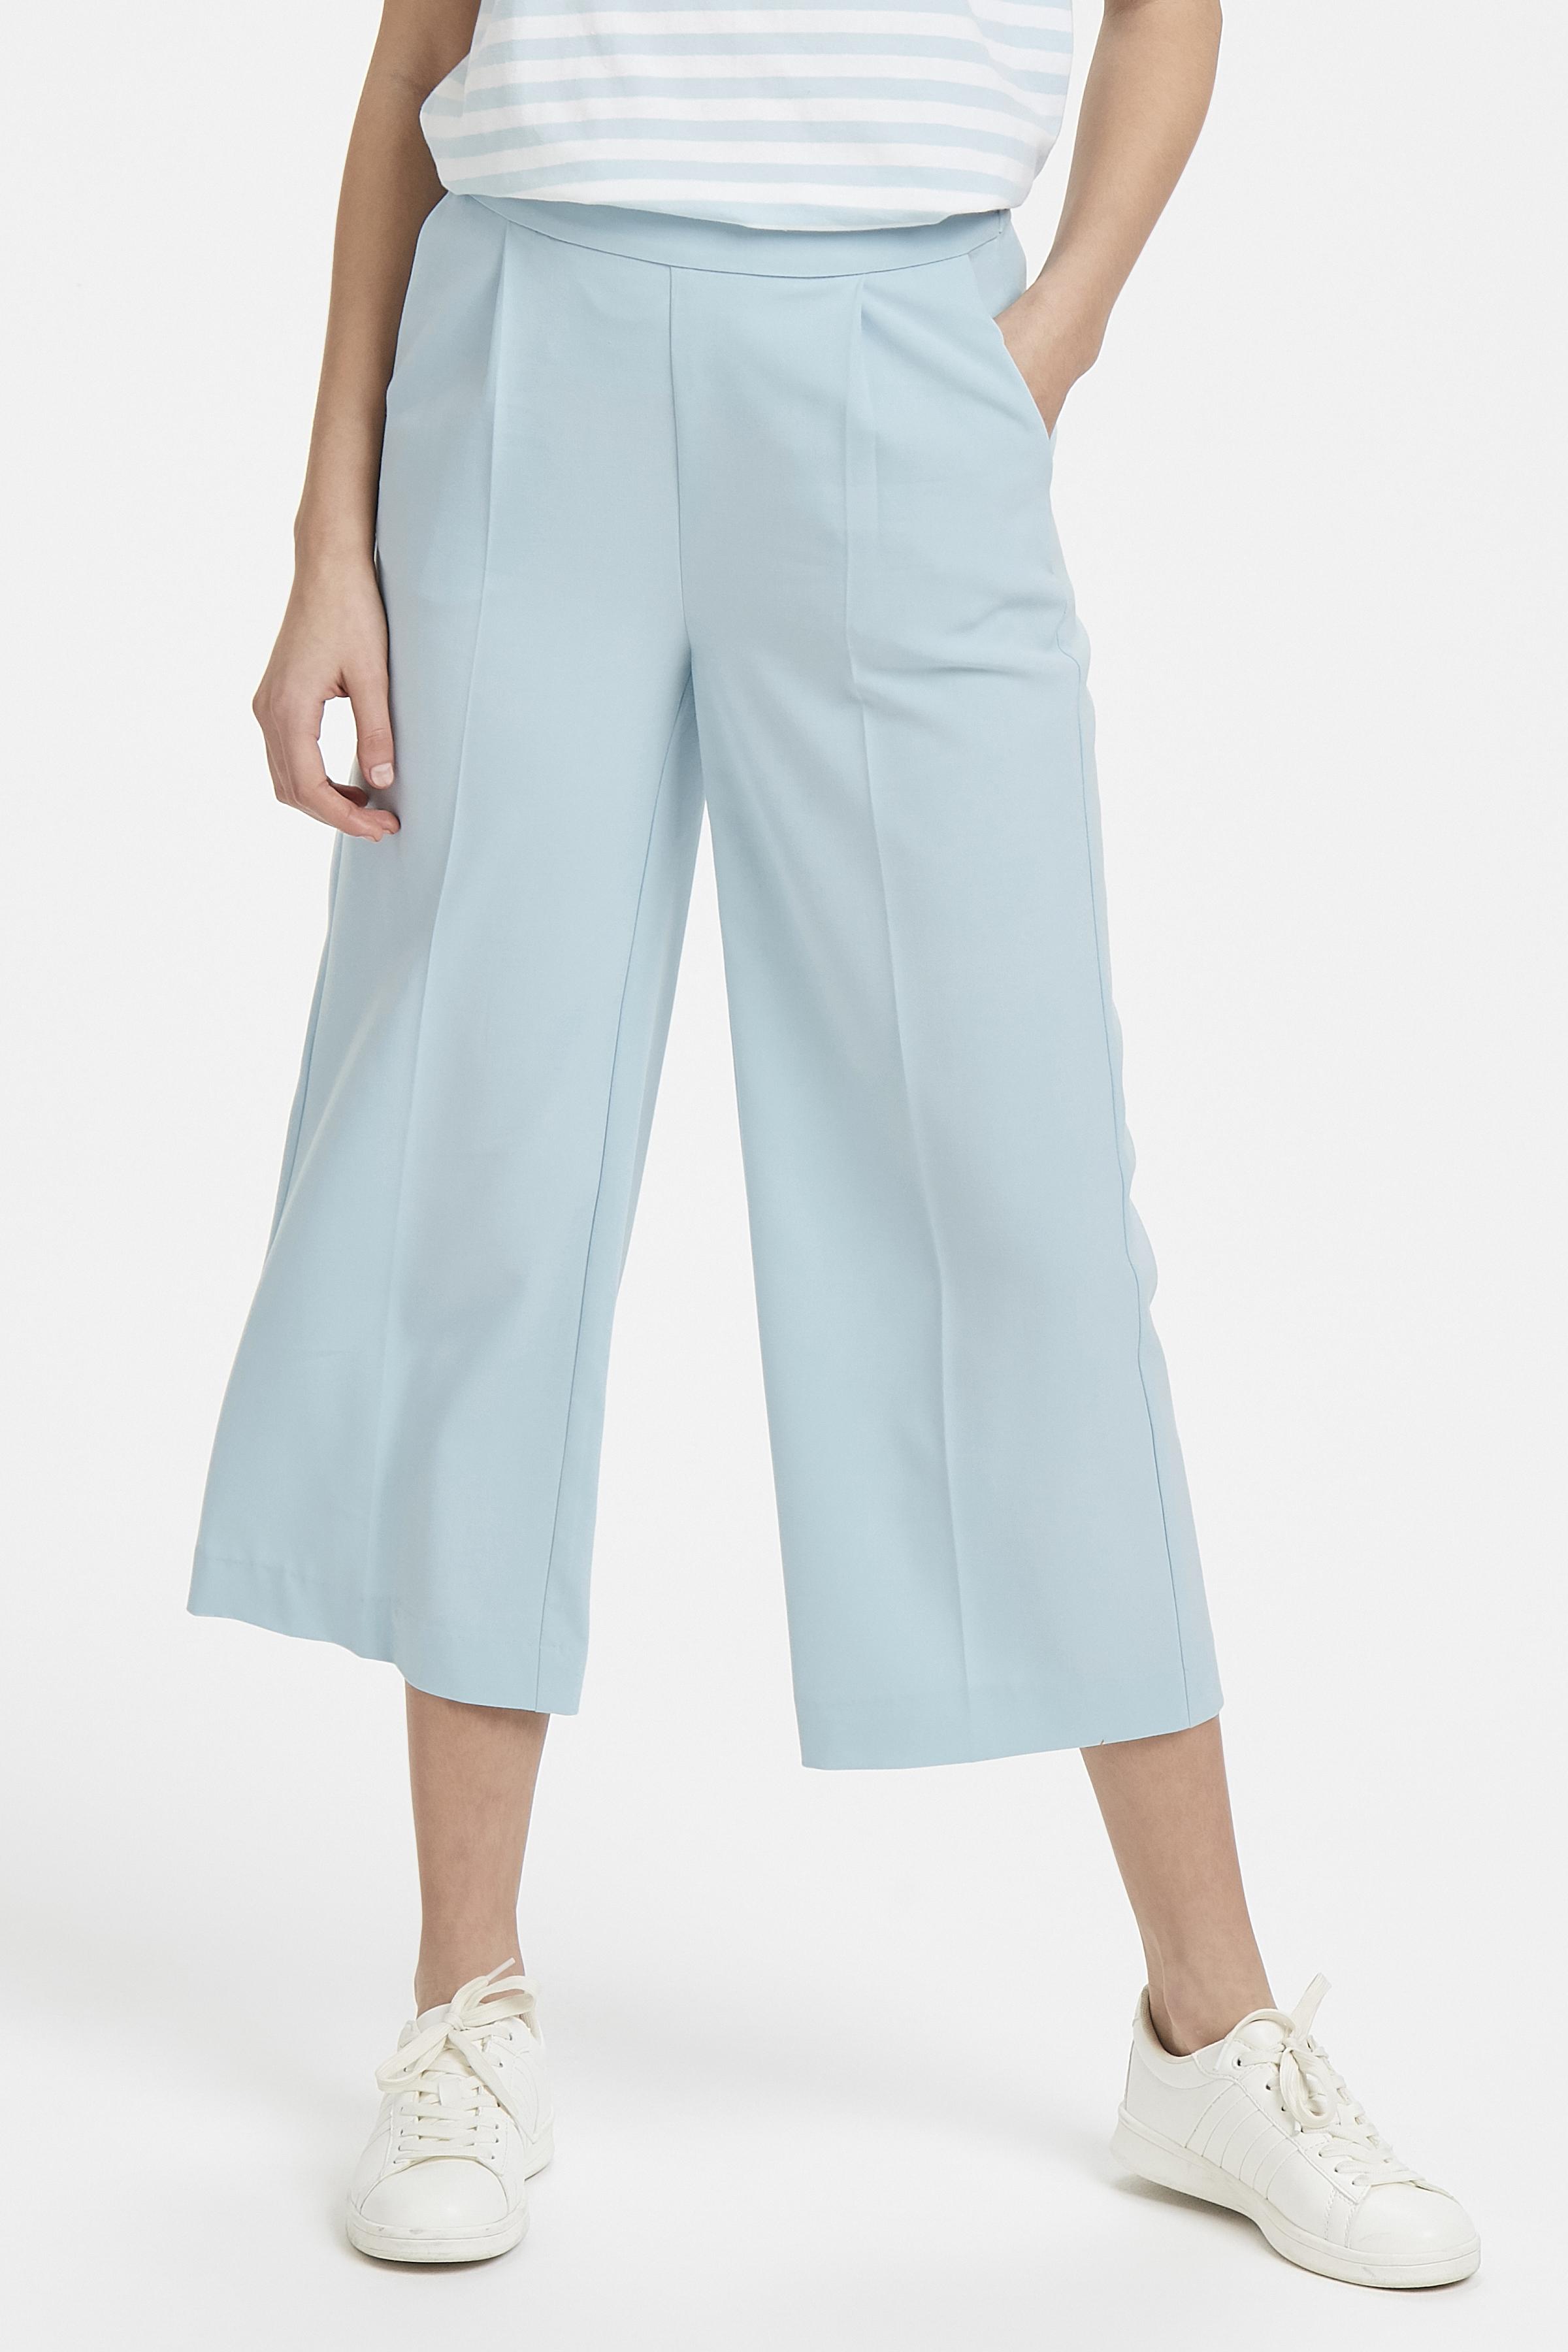 Corydalis Blue Pants Casual fra Ichi – Køb Corydalis Blue Pants Casual fra str. 34-42 her